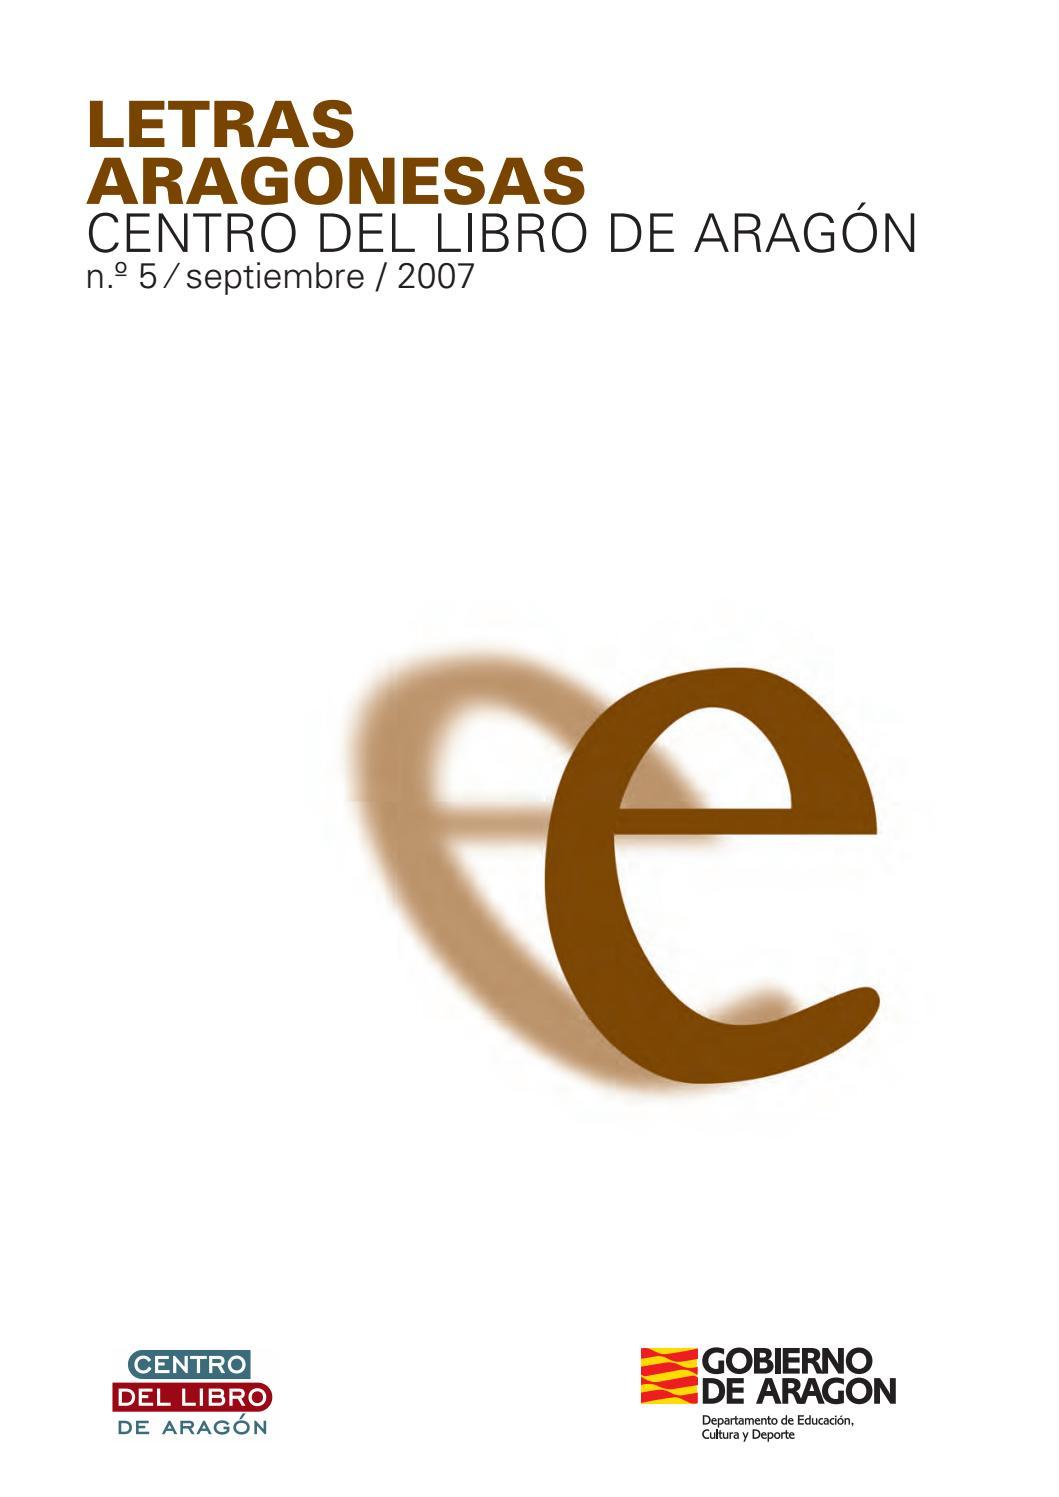 Letras aragonesas e by yoherlim lazaro cangalaya - issuu aa13694d1e